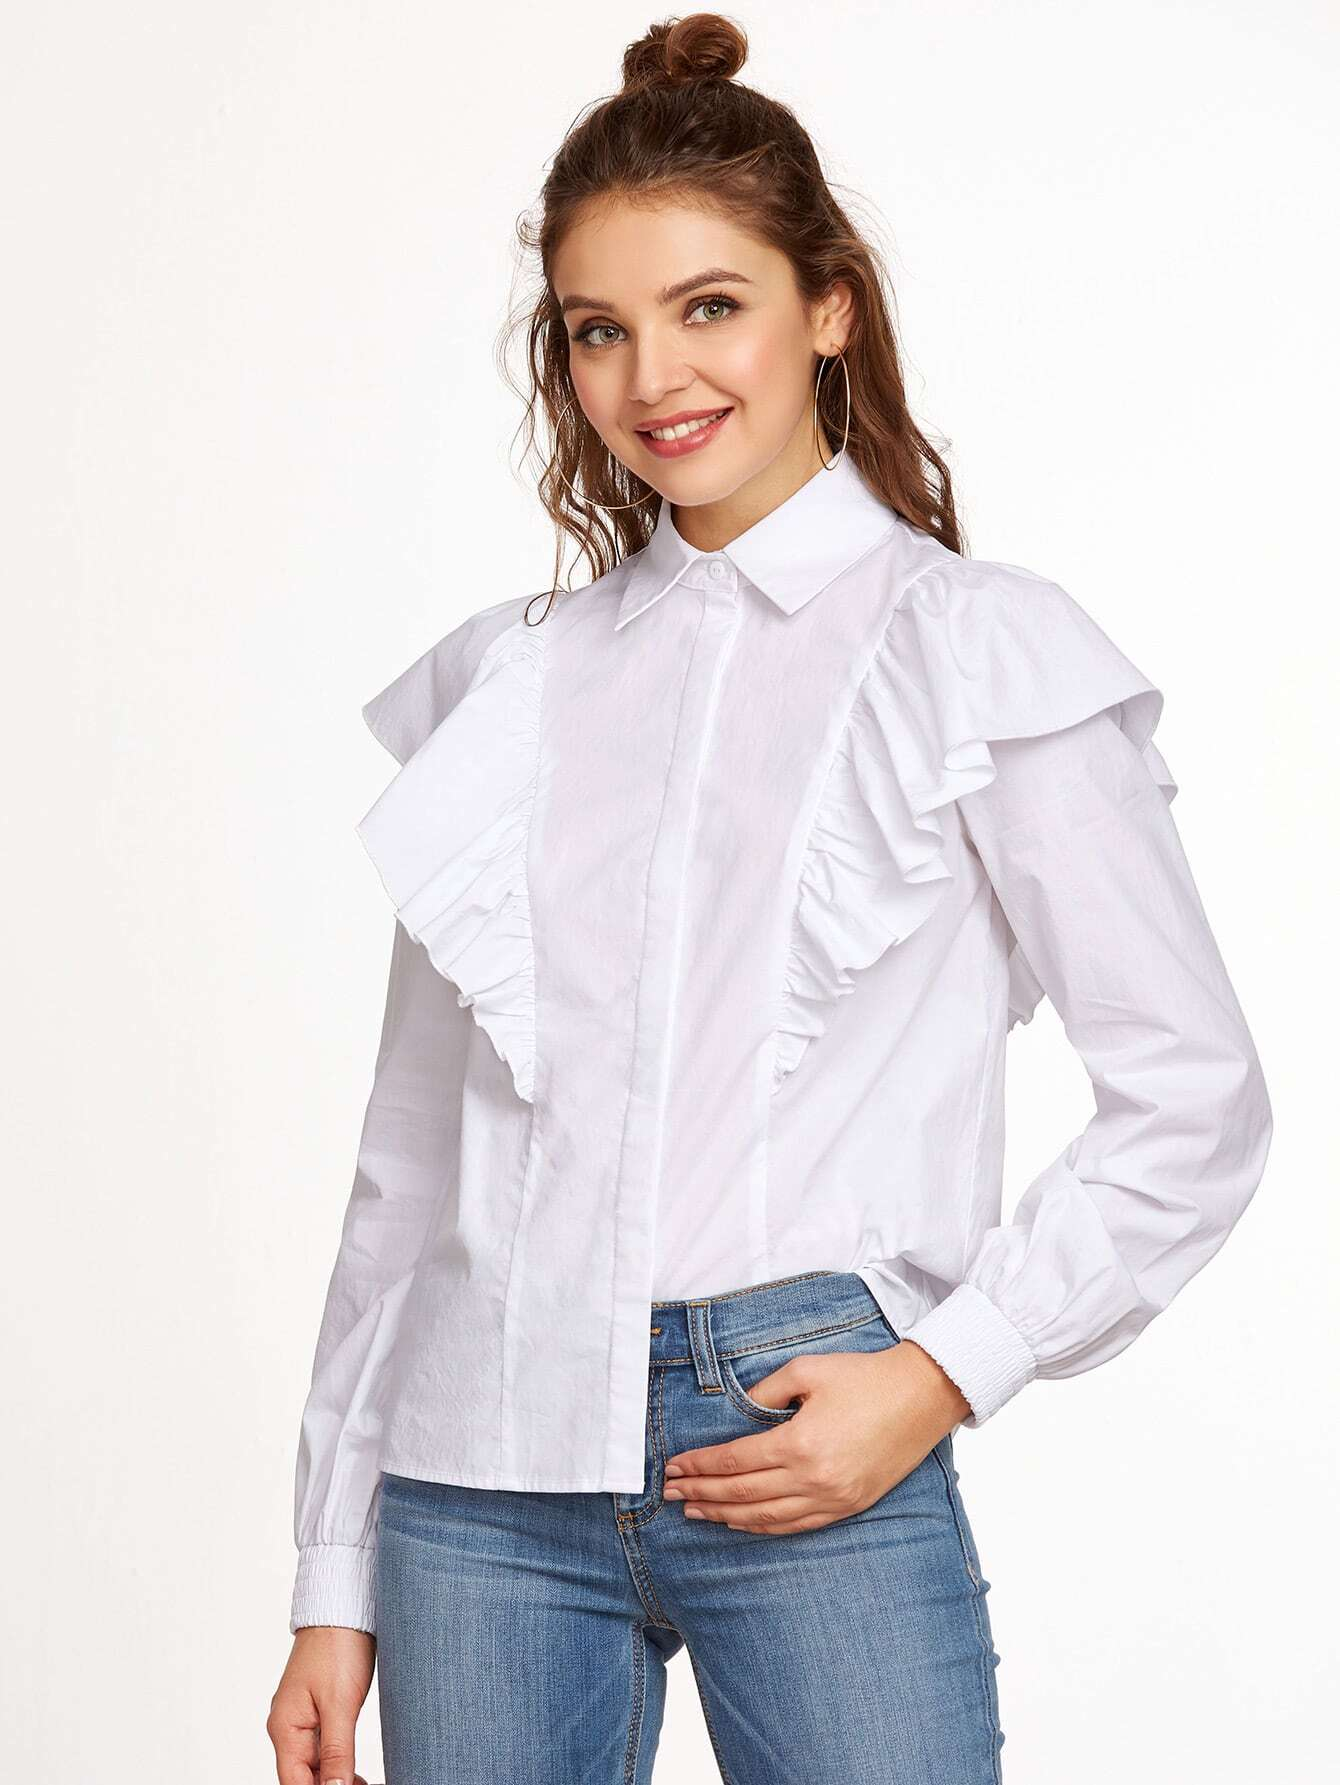 blouse161114701_2